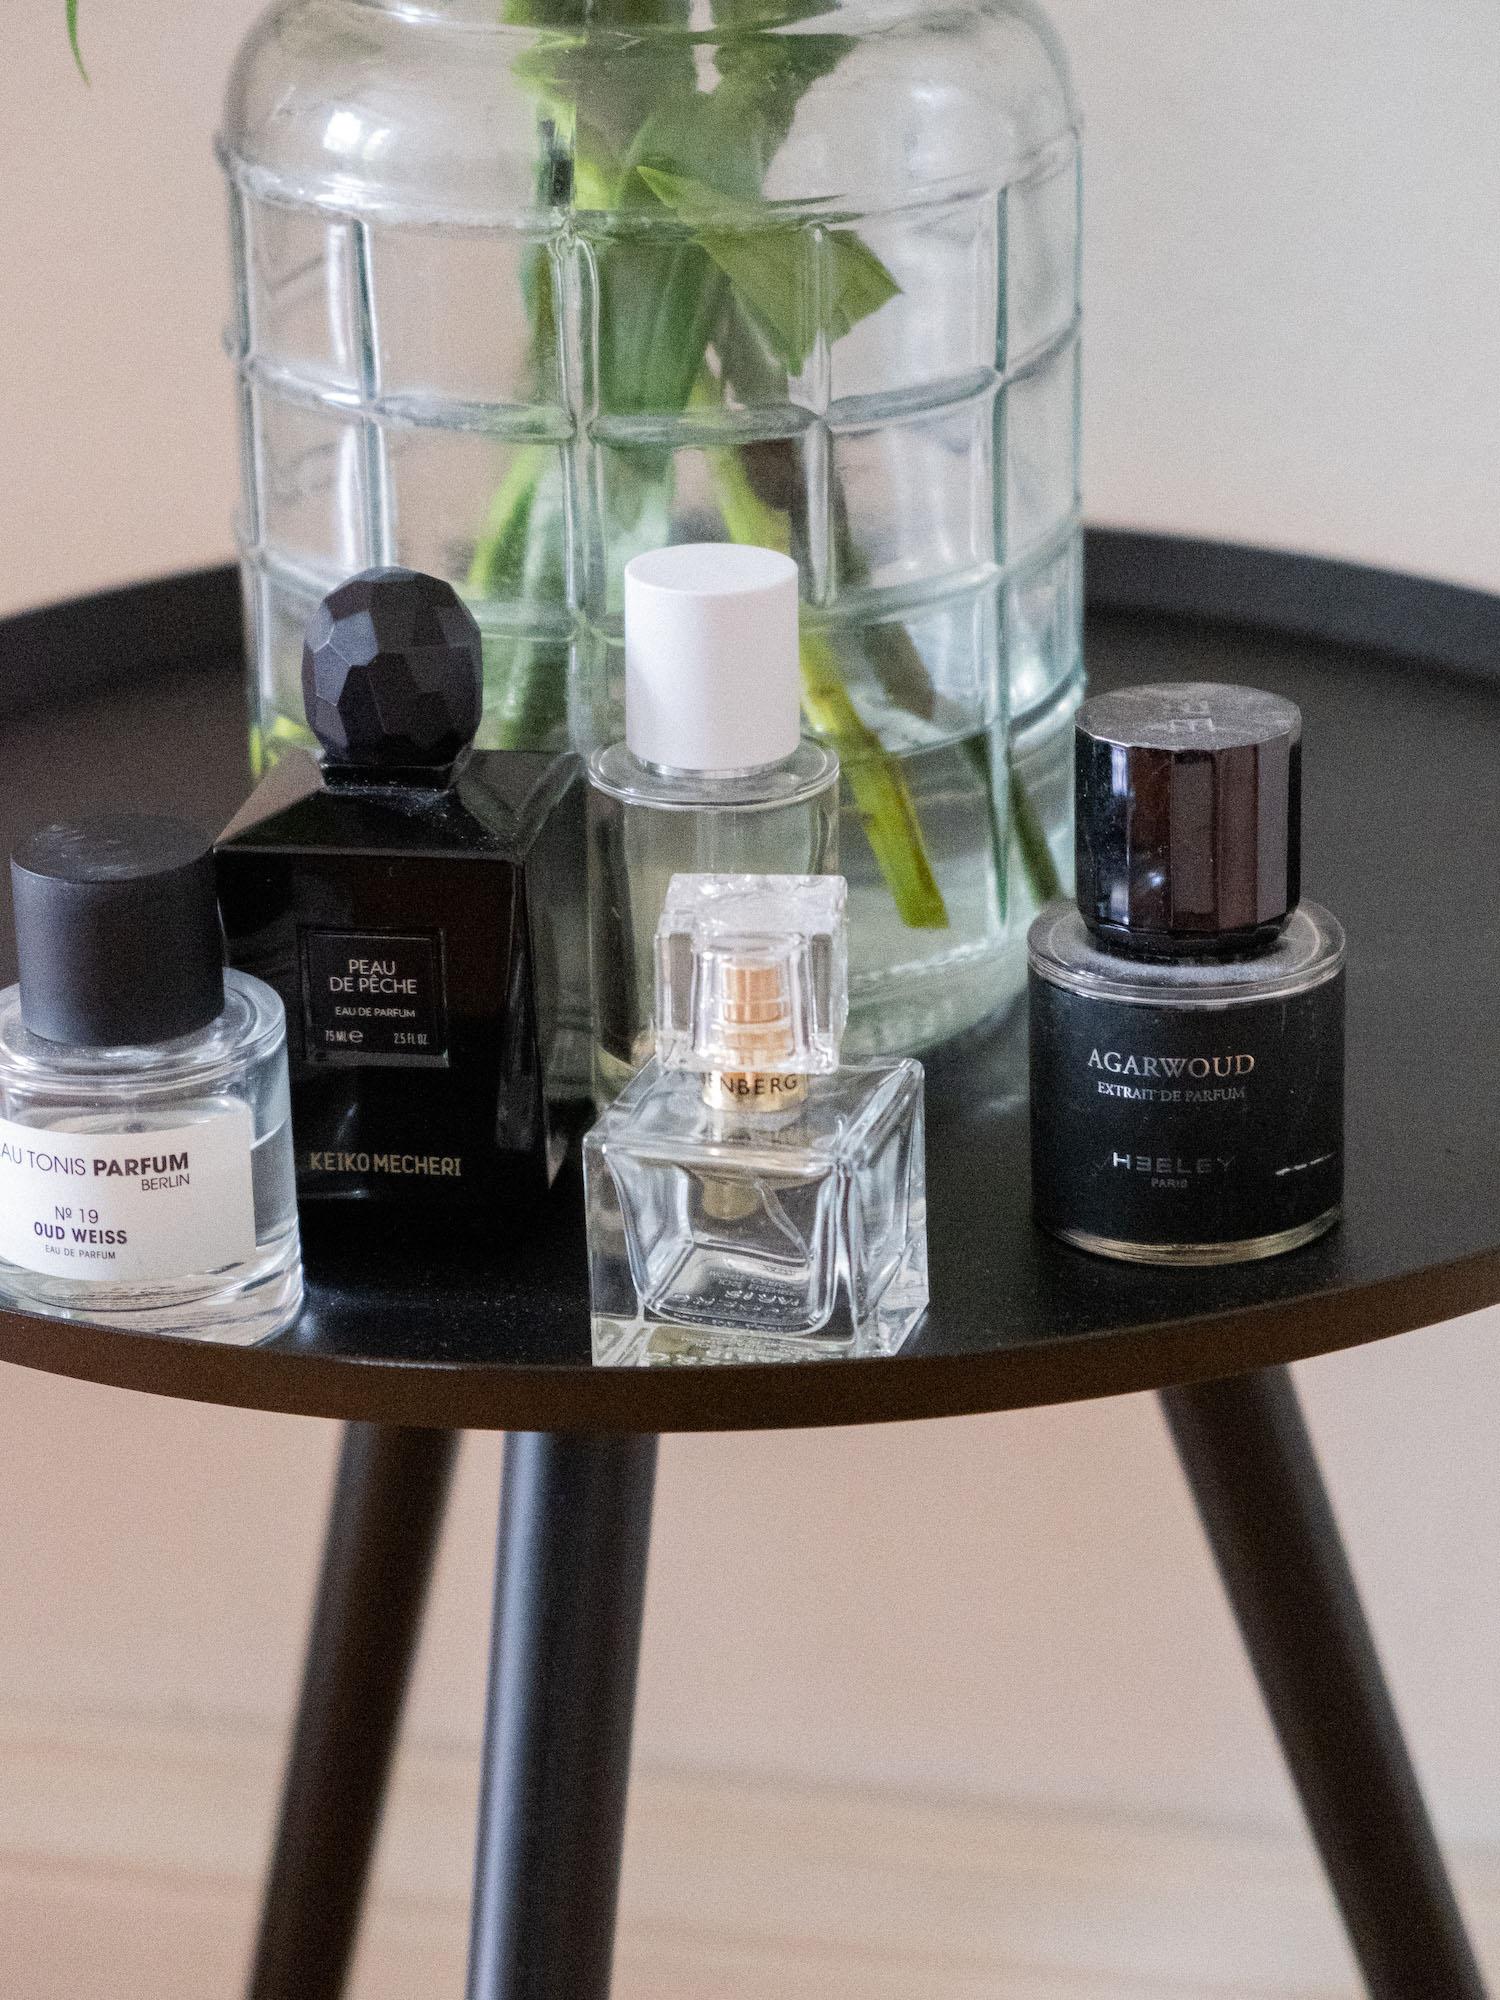 Beautyblog Parfum Peau de Peche